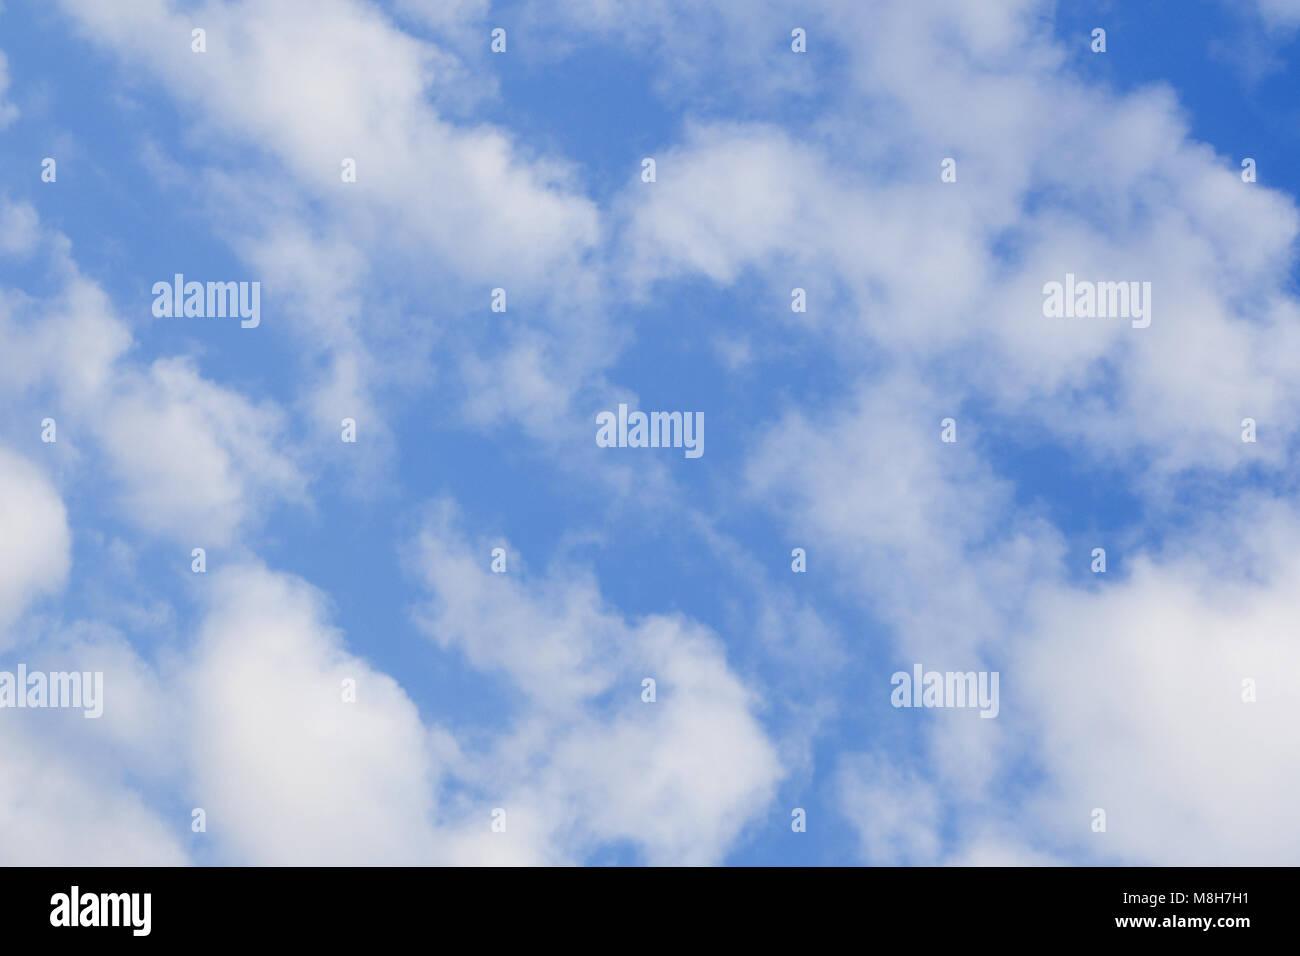 Fotos E Imagenes Cielo Azul Con Nubes: Hermoso Cielo Azul Con Nubes Background.Cielo.Nubes Cielo